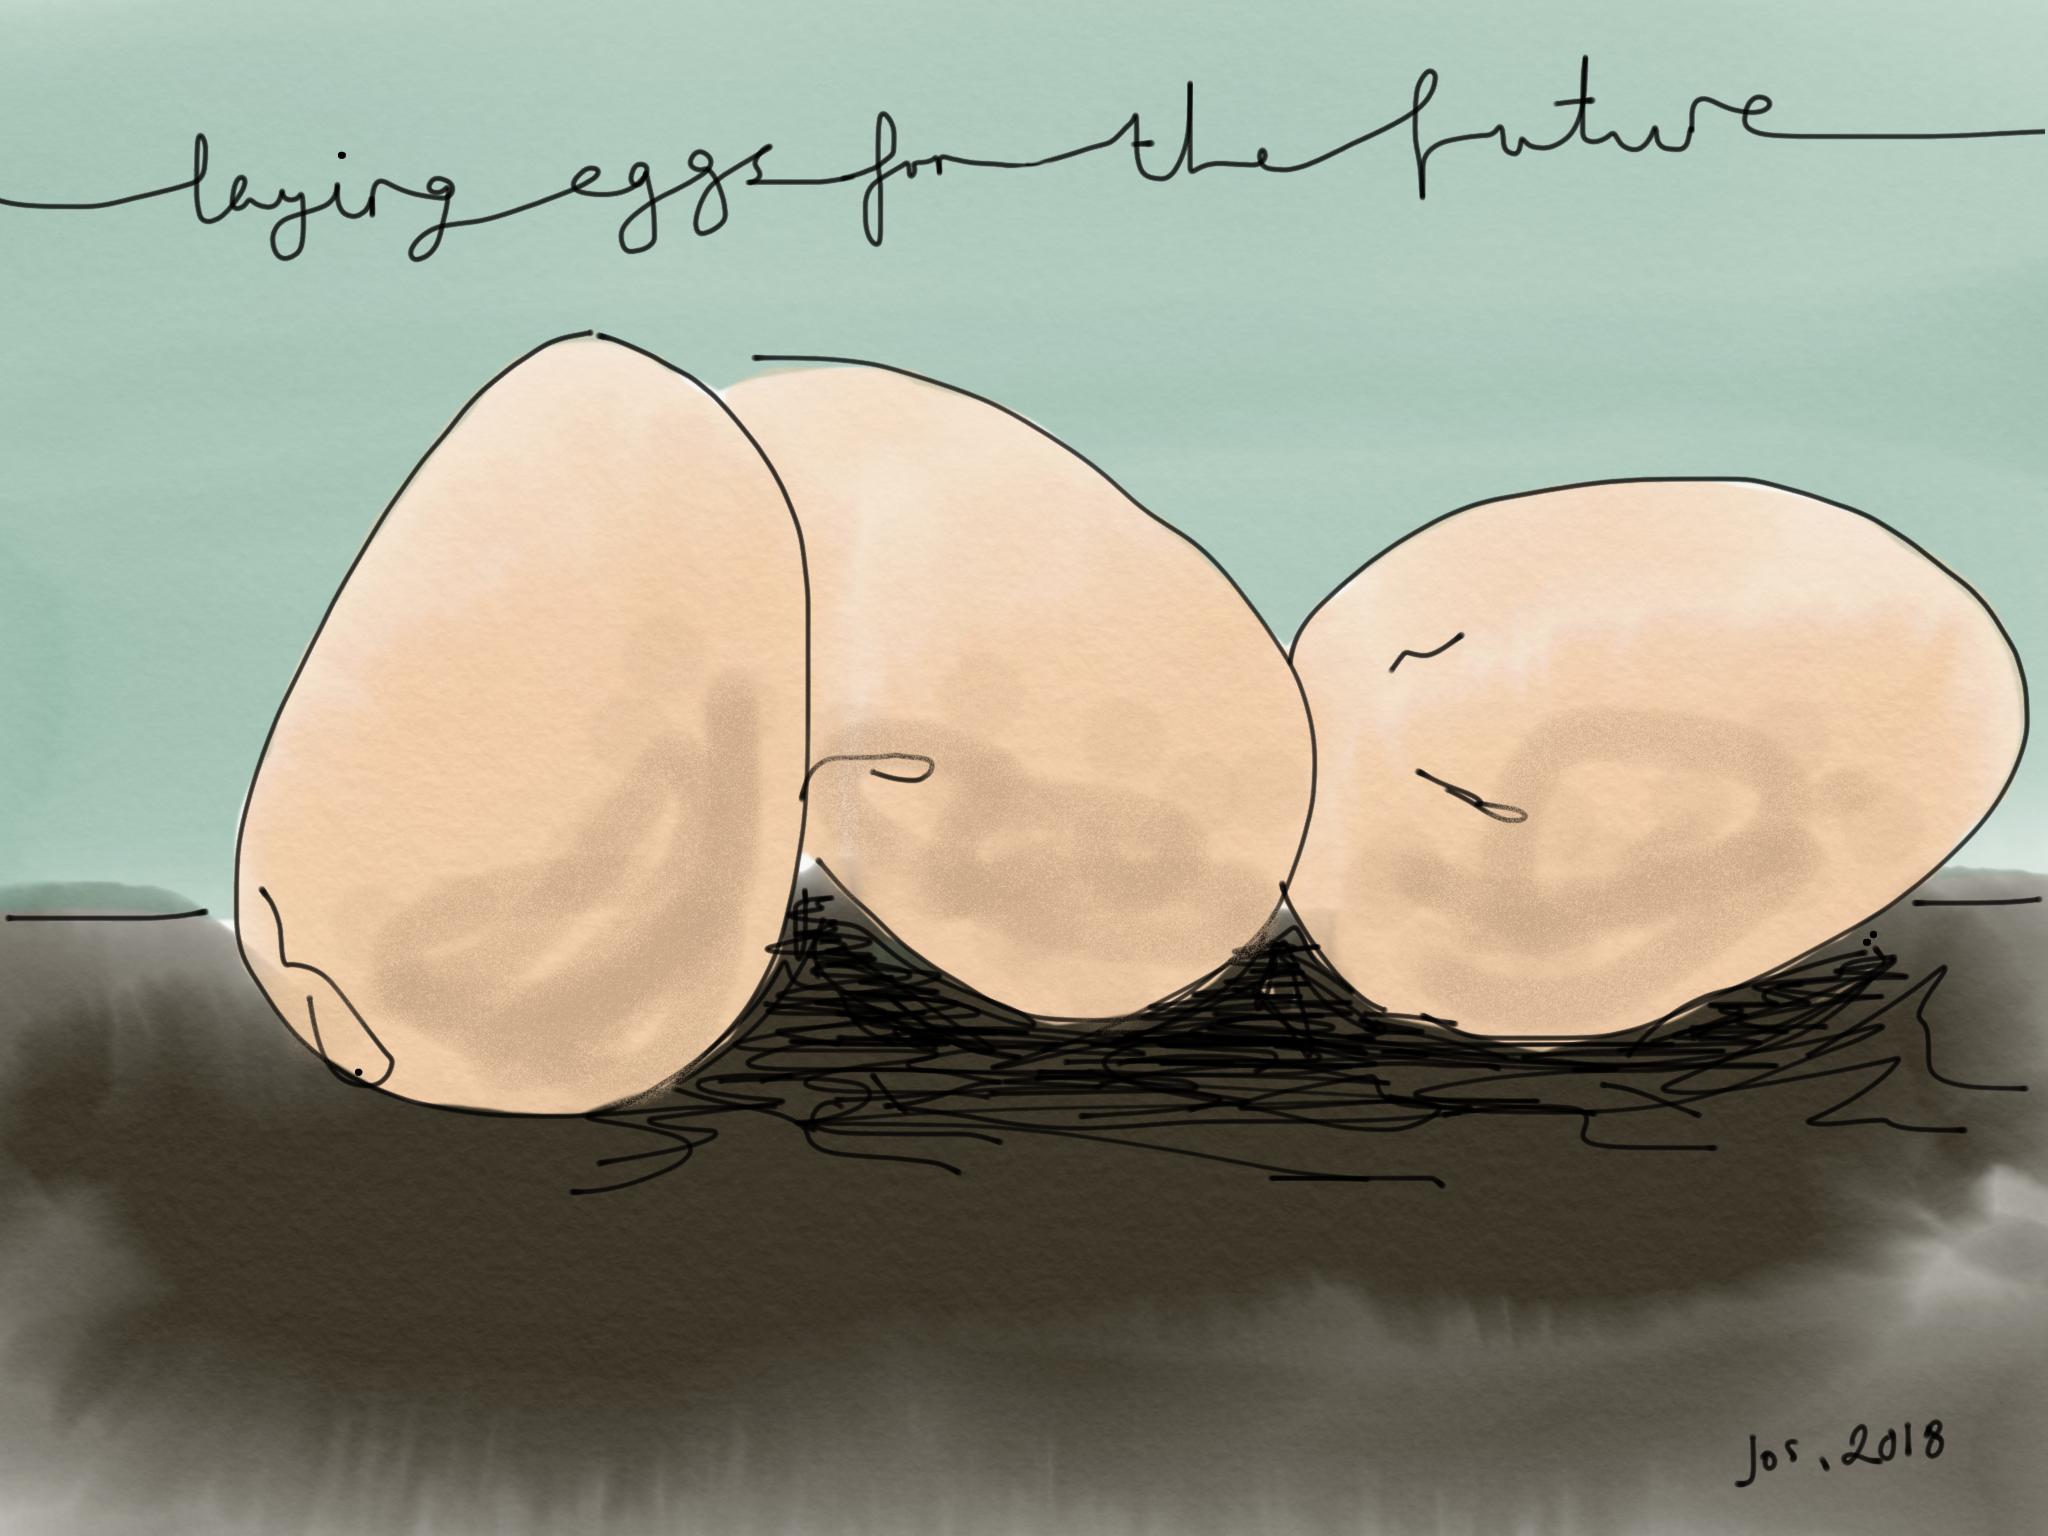 Hatcheries - The gift of old ageNurture the eggs, tender loveWatch, chicks will hatch